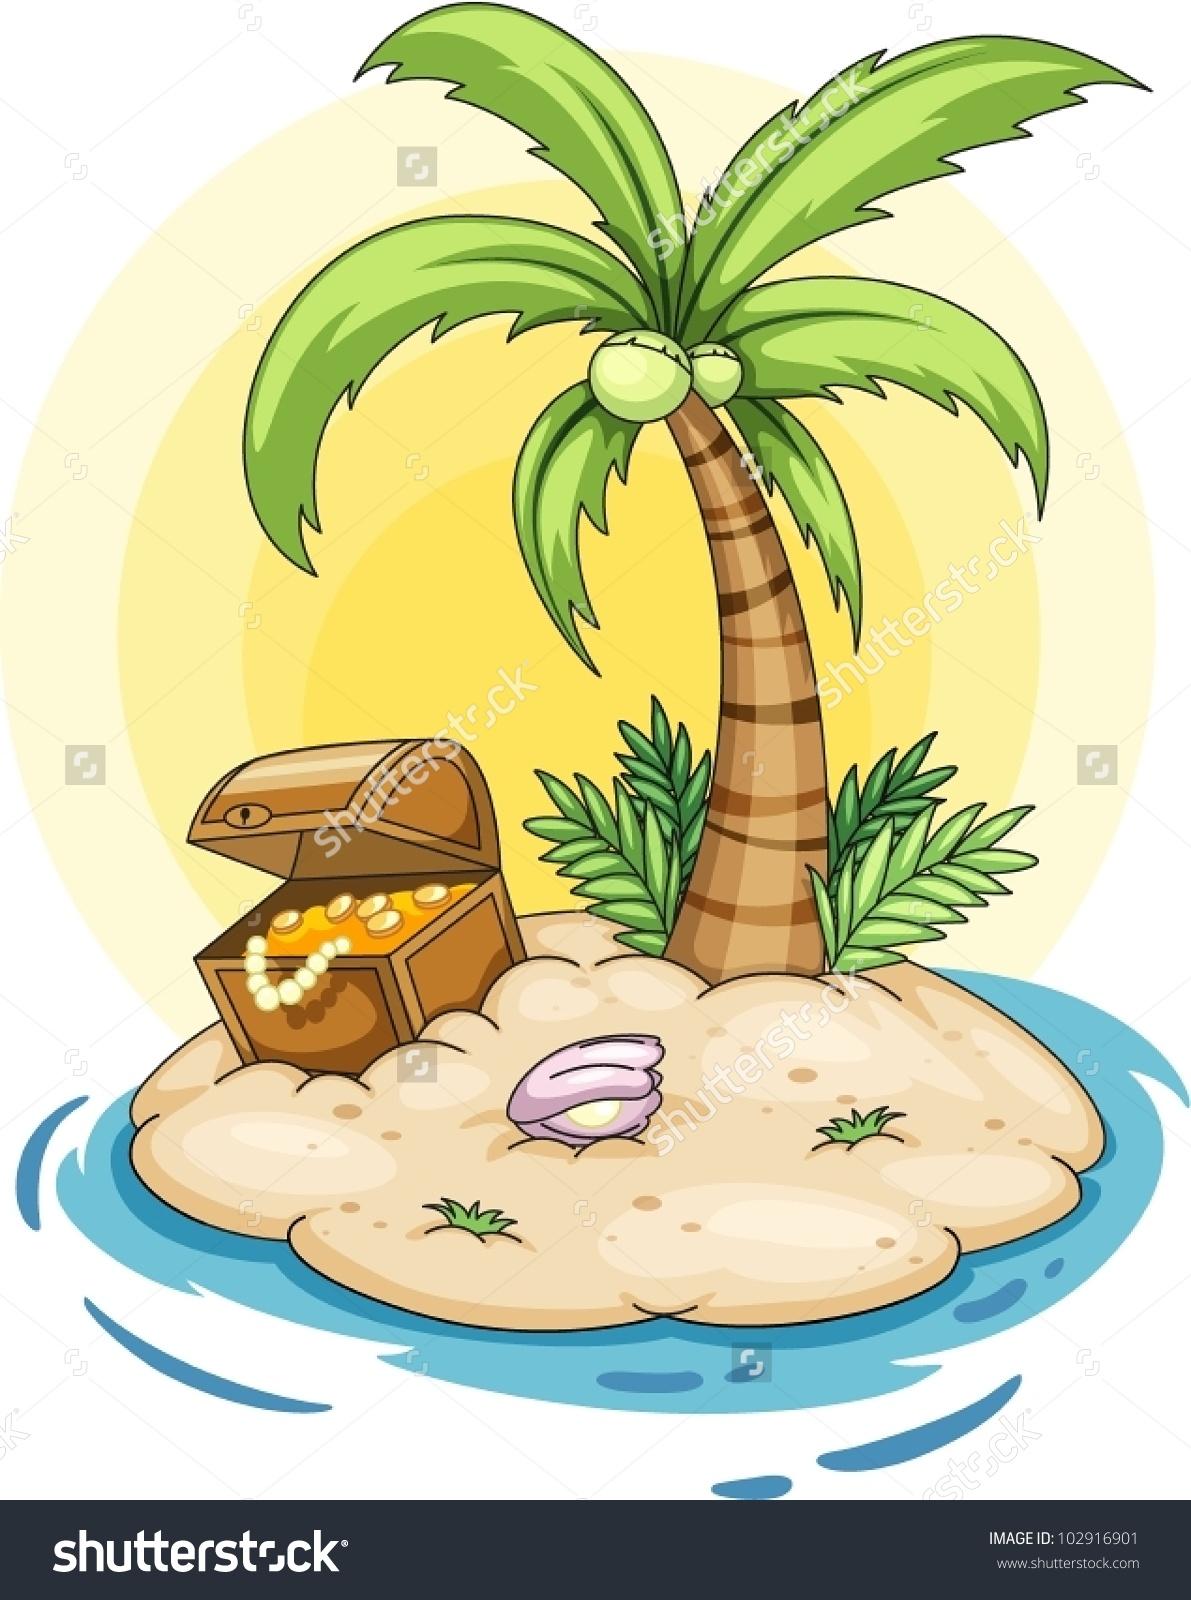 Free clipart treasure island.